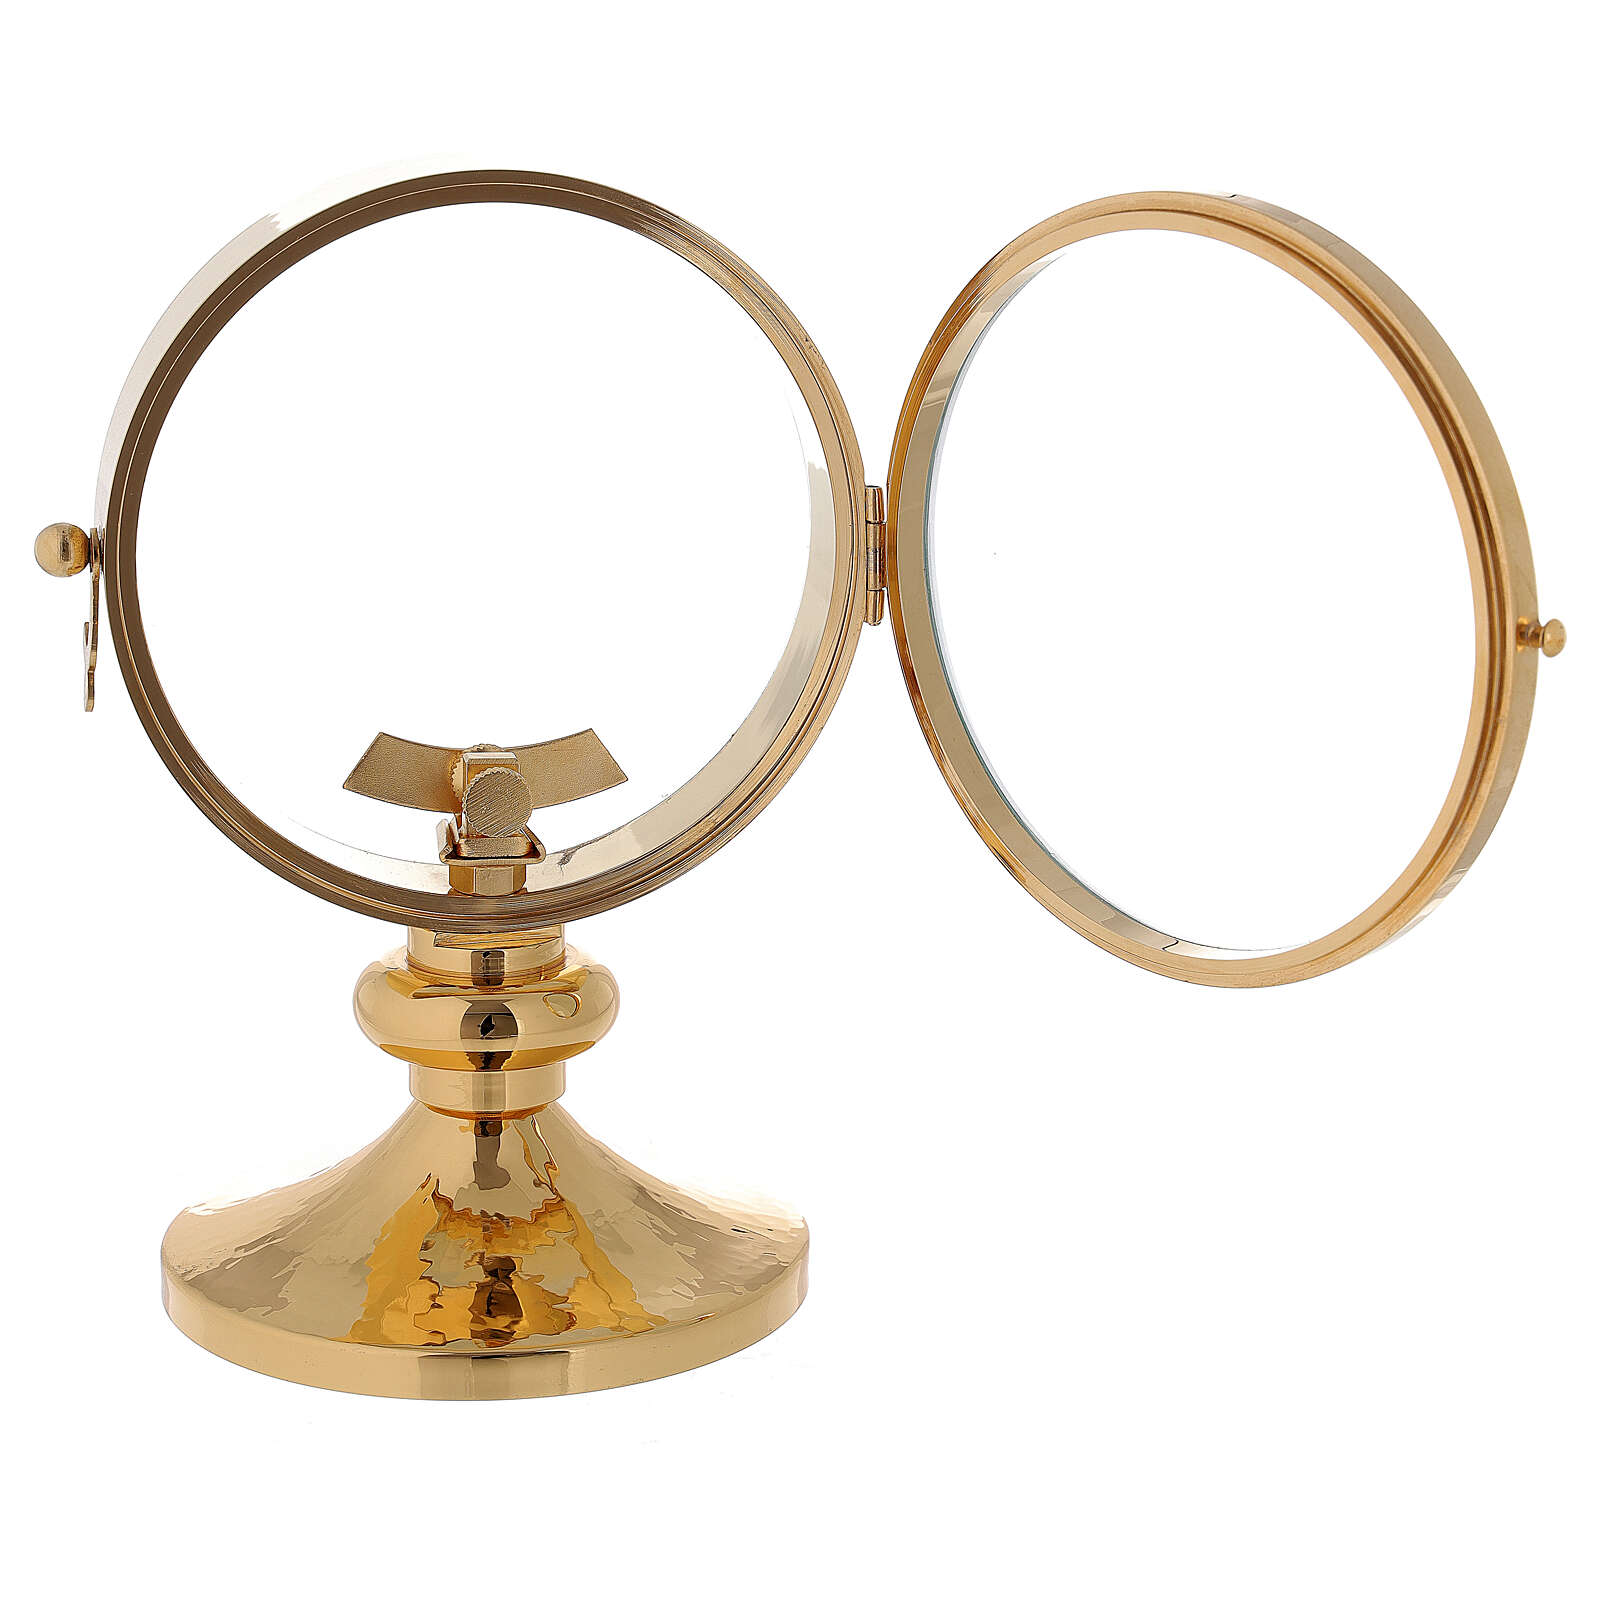 STOCK Ostensorio teca ottone dorato liscio diametro 11 cm 4